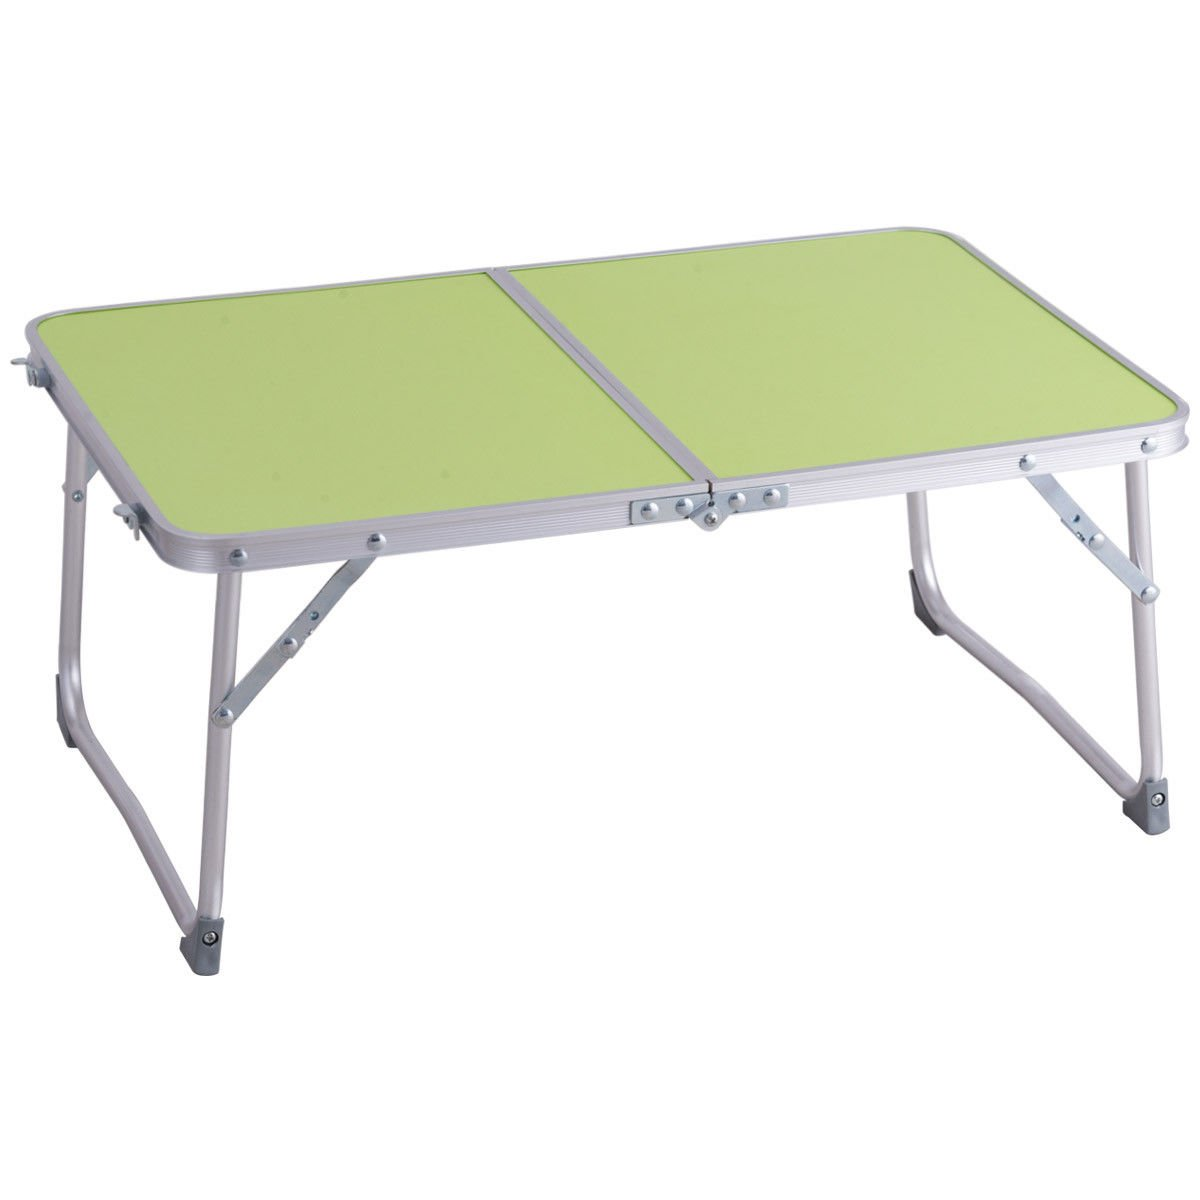 KCHEX>ポータブル折りたたみテーブル 車 ベッド ソファ ノートパソコン デスク トレイ スタンド グリーン>このエレガントなミニ折りたたみアルミテーブルは、キャンプや外出、仕事、自宅での使用に最適で、耐久性が特長です。   B07JV8Y5S8